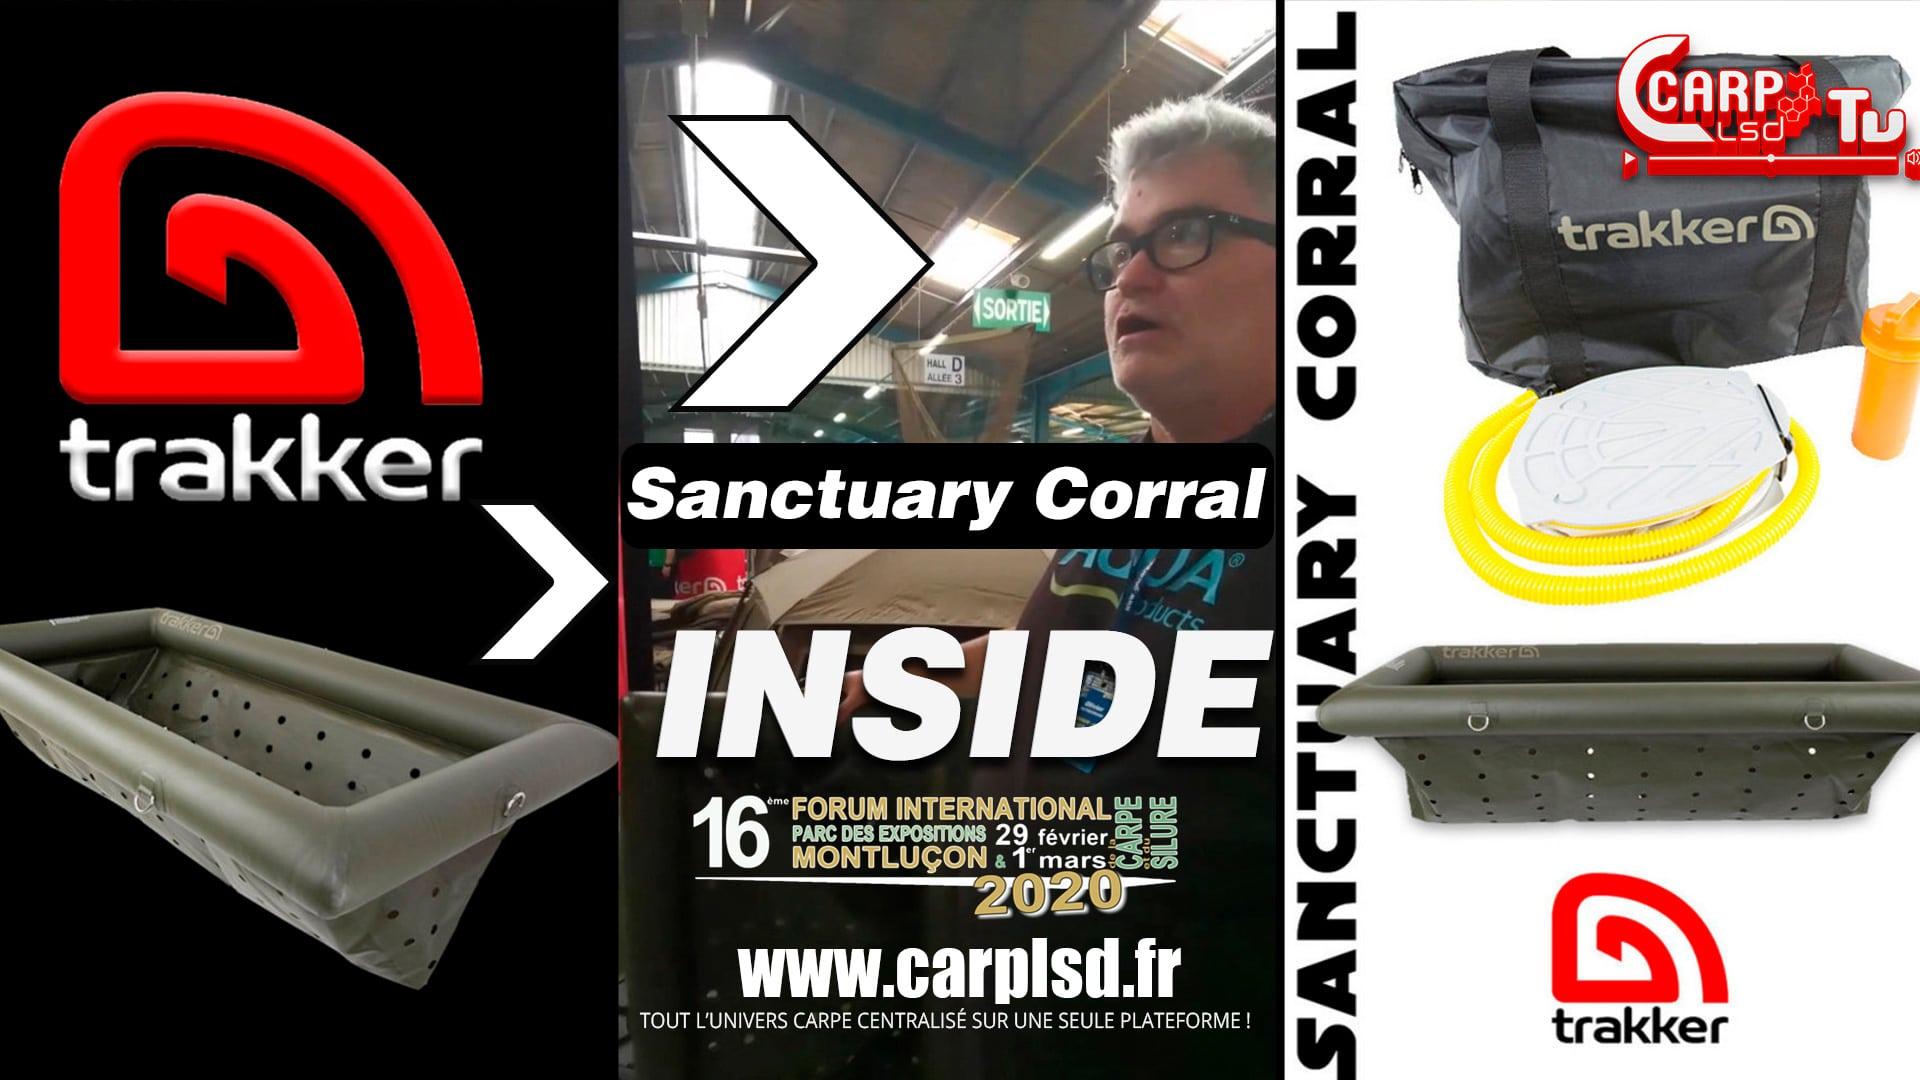 Sanctuary Corral